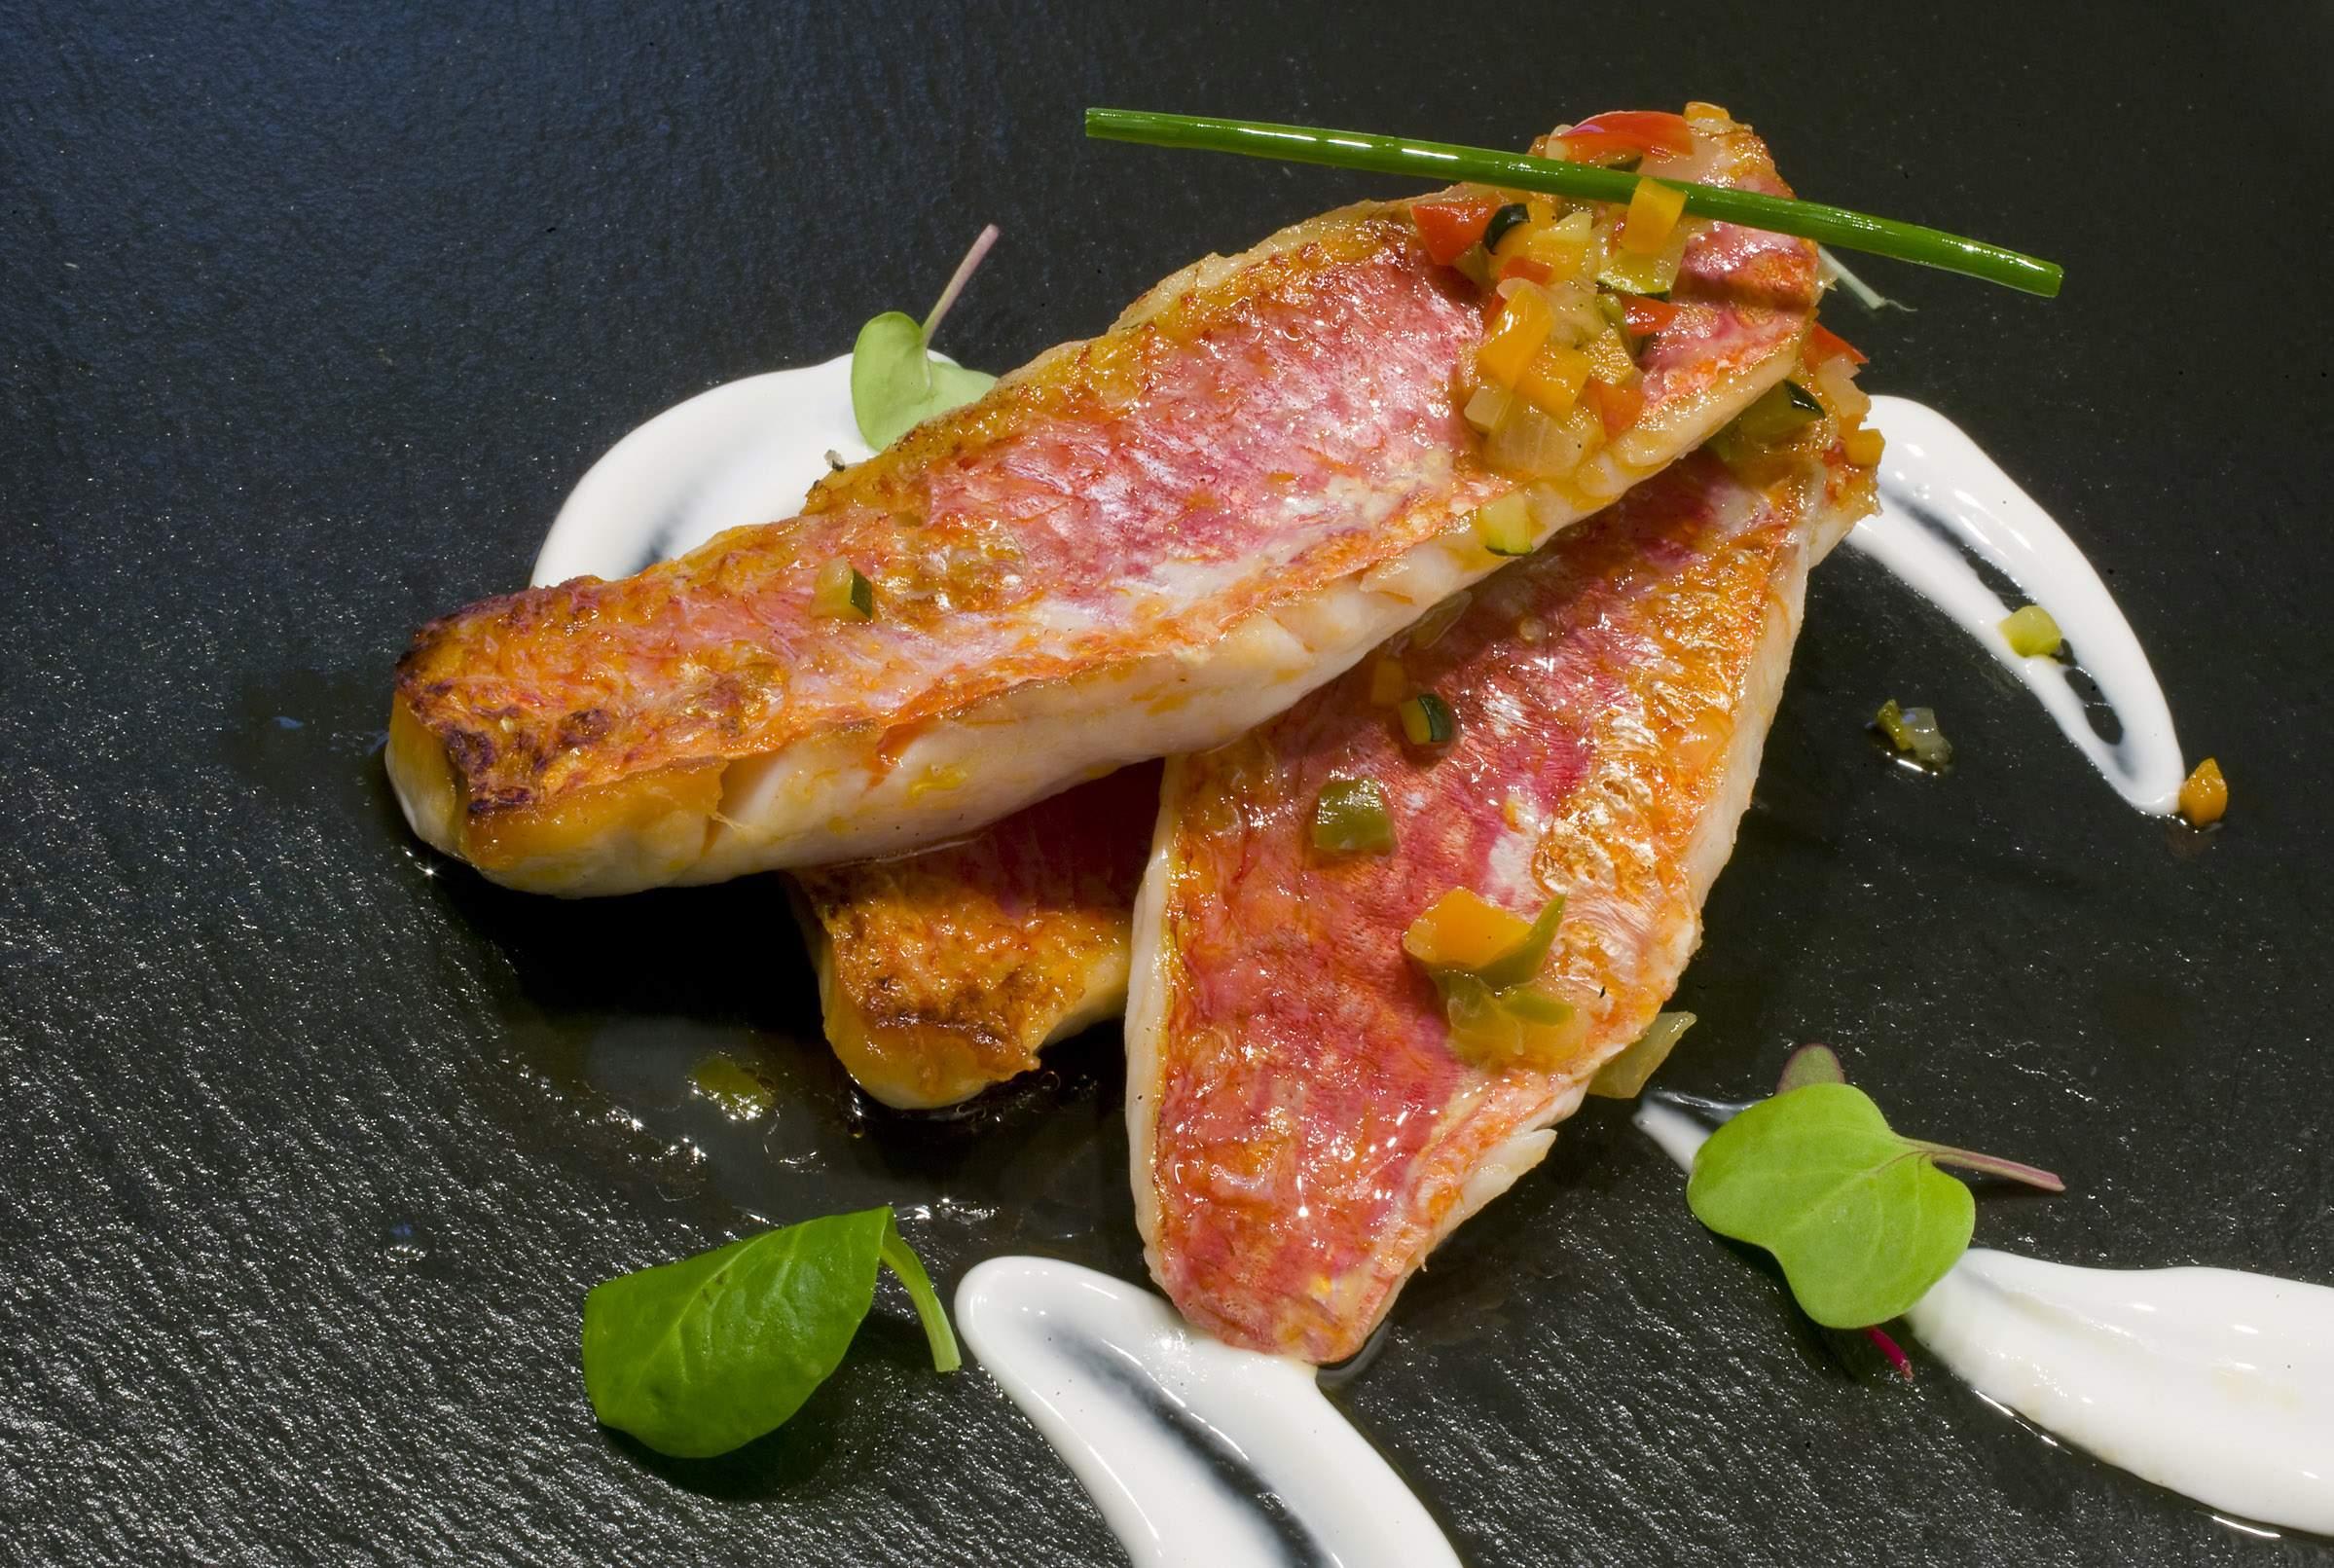 Recetas de salmón: Salmonetes a la plancha con verduras